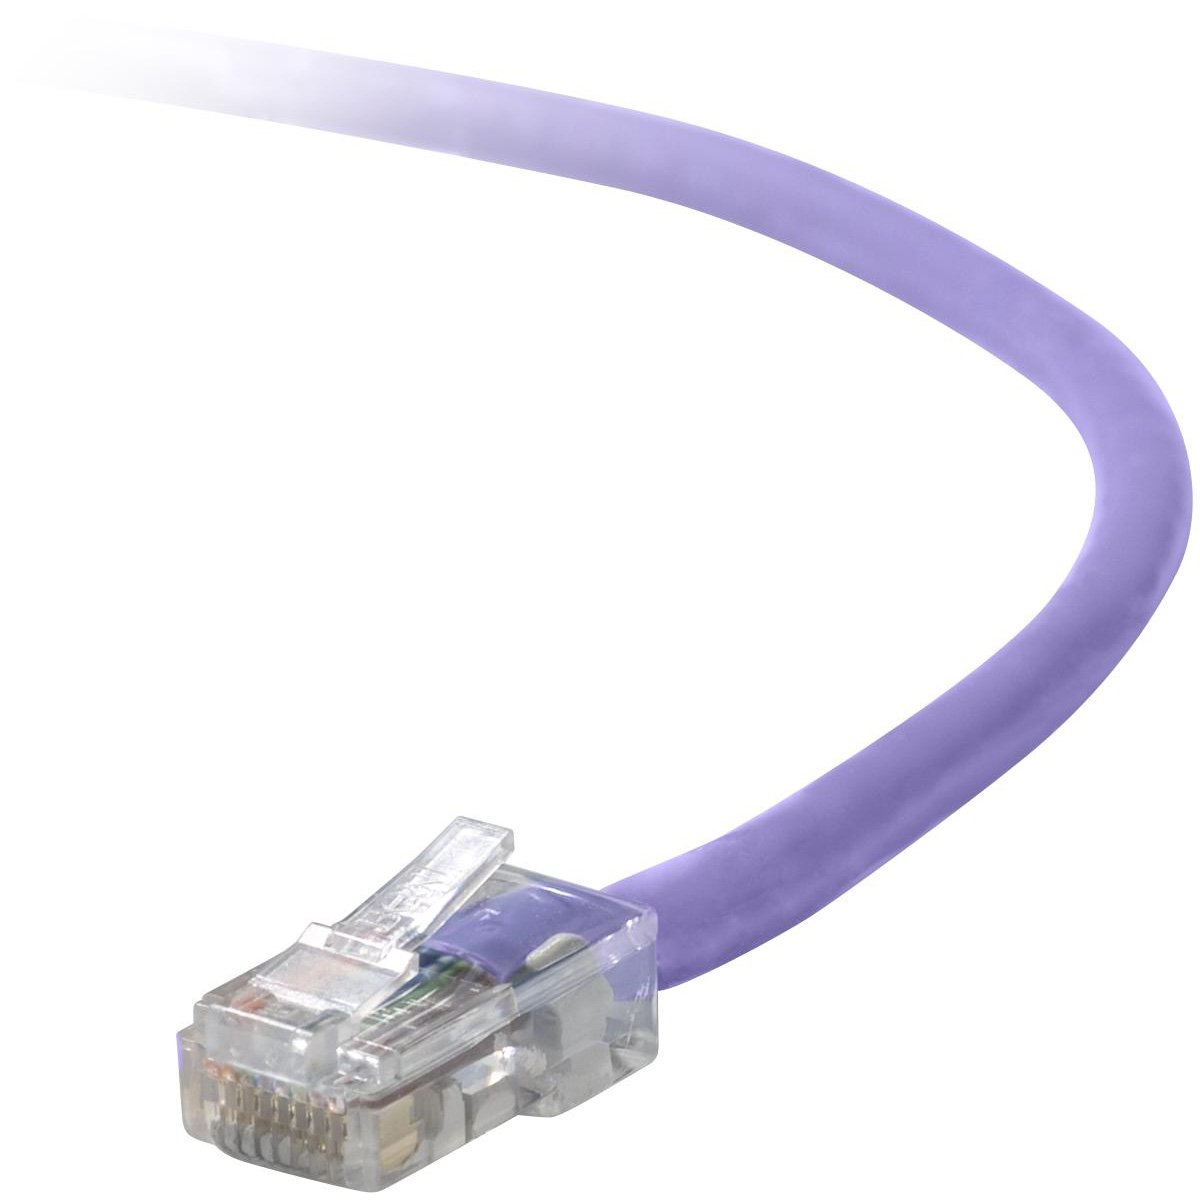 BELKIN cat5e 10ft purple rj45m//m patch cable w//snagless boot A3L791-10-PUR-S